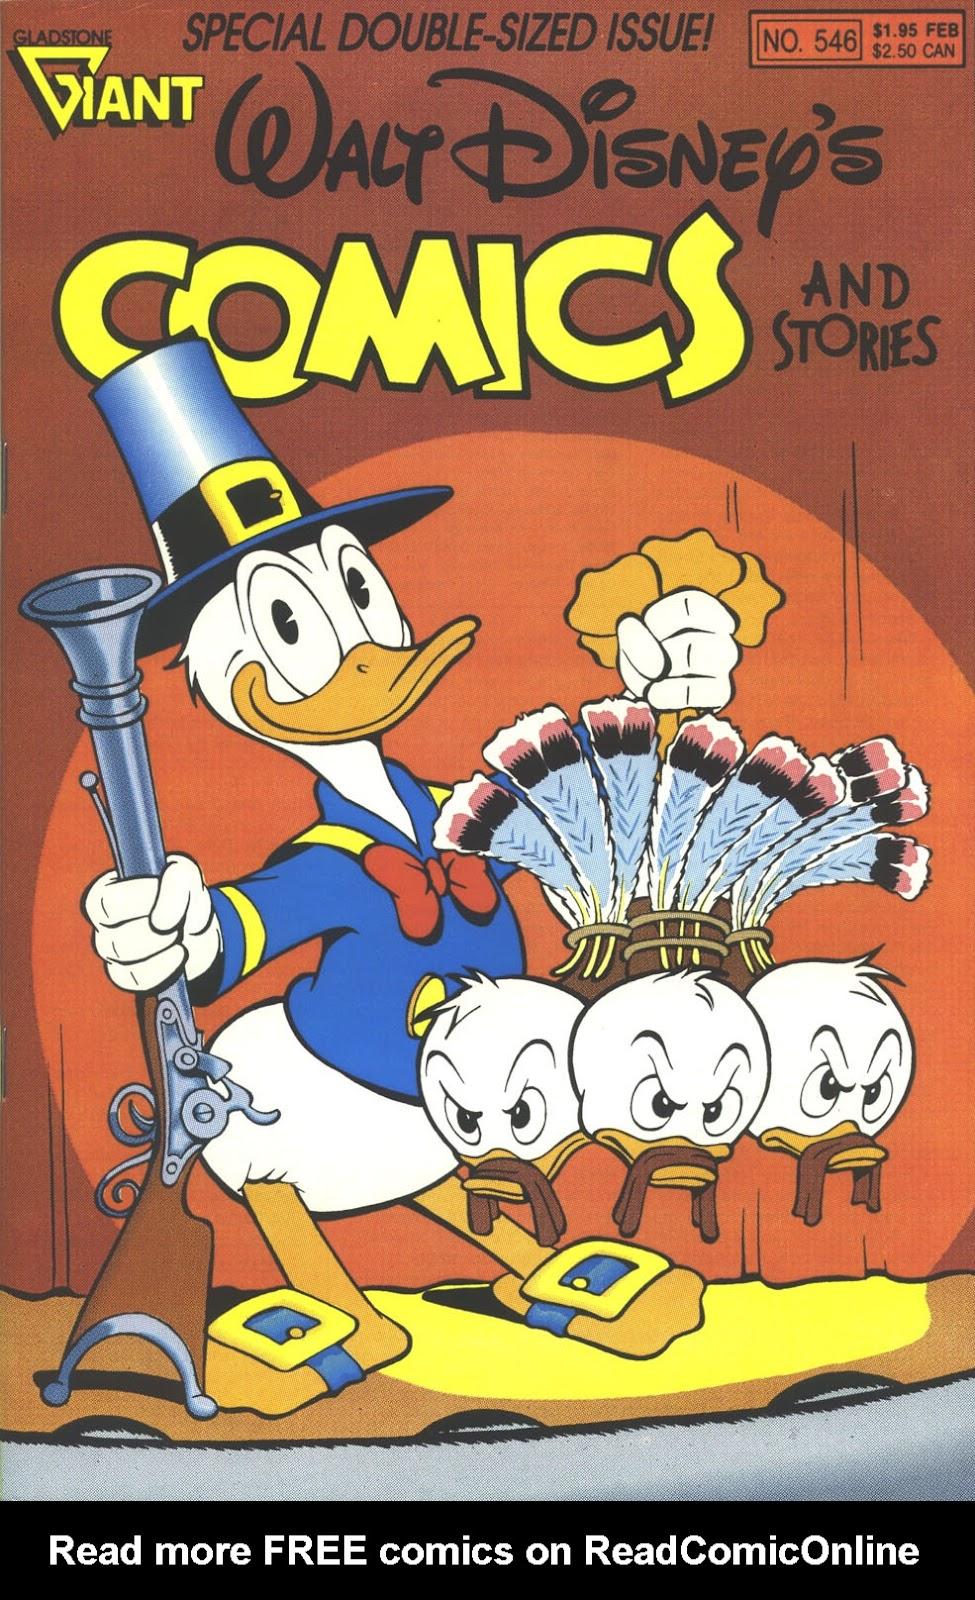 Walt Disneys Comics and Stories 546 Page 1